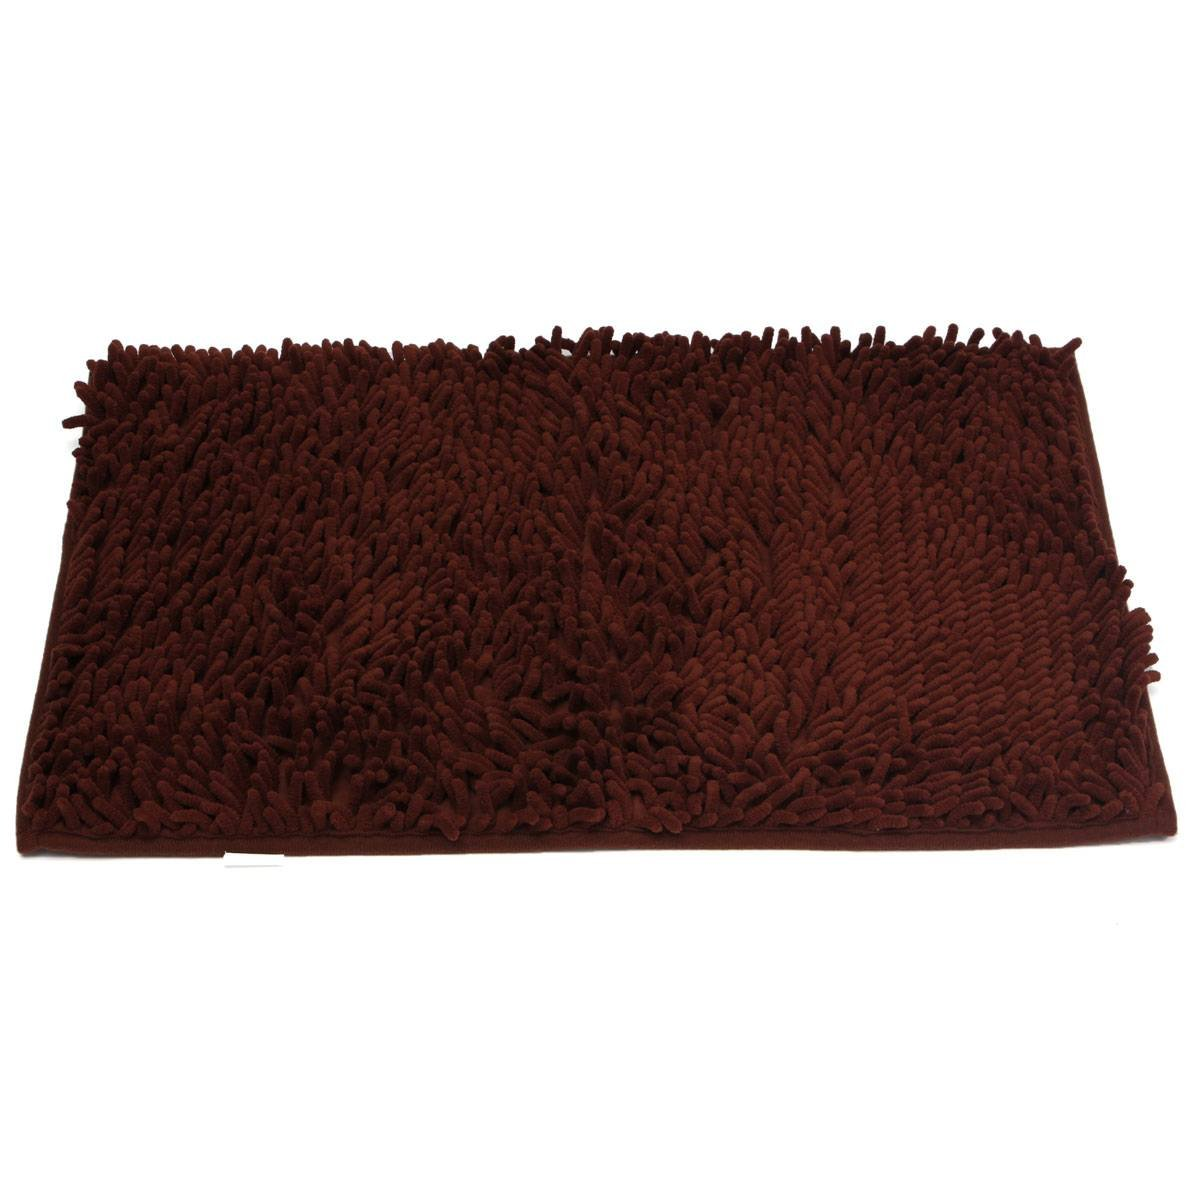 Thick Bathroom Rugs Online Get Cheap Thick Bath Mats Aliexpresscom Alibaba Group